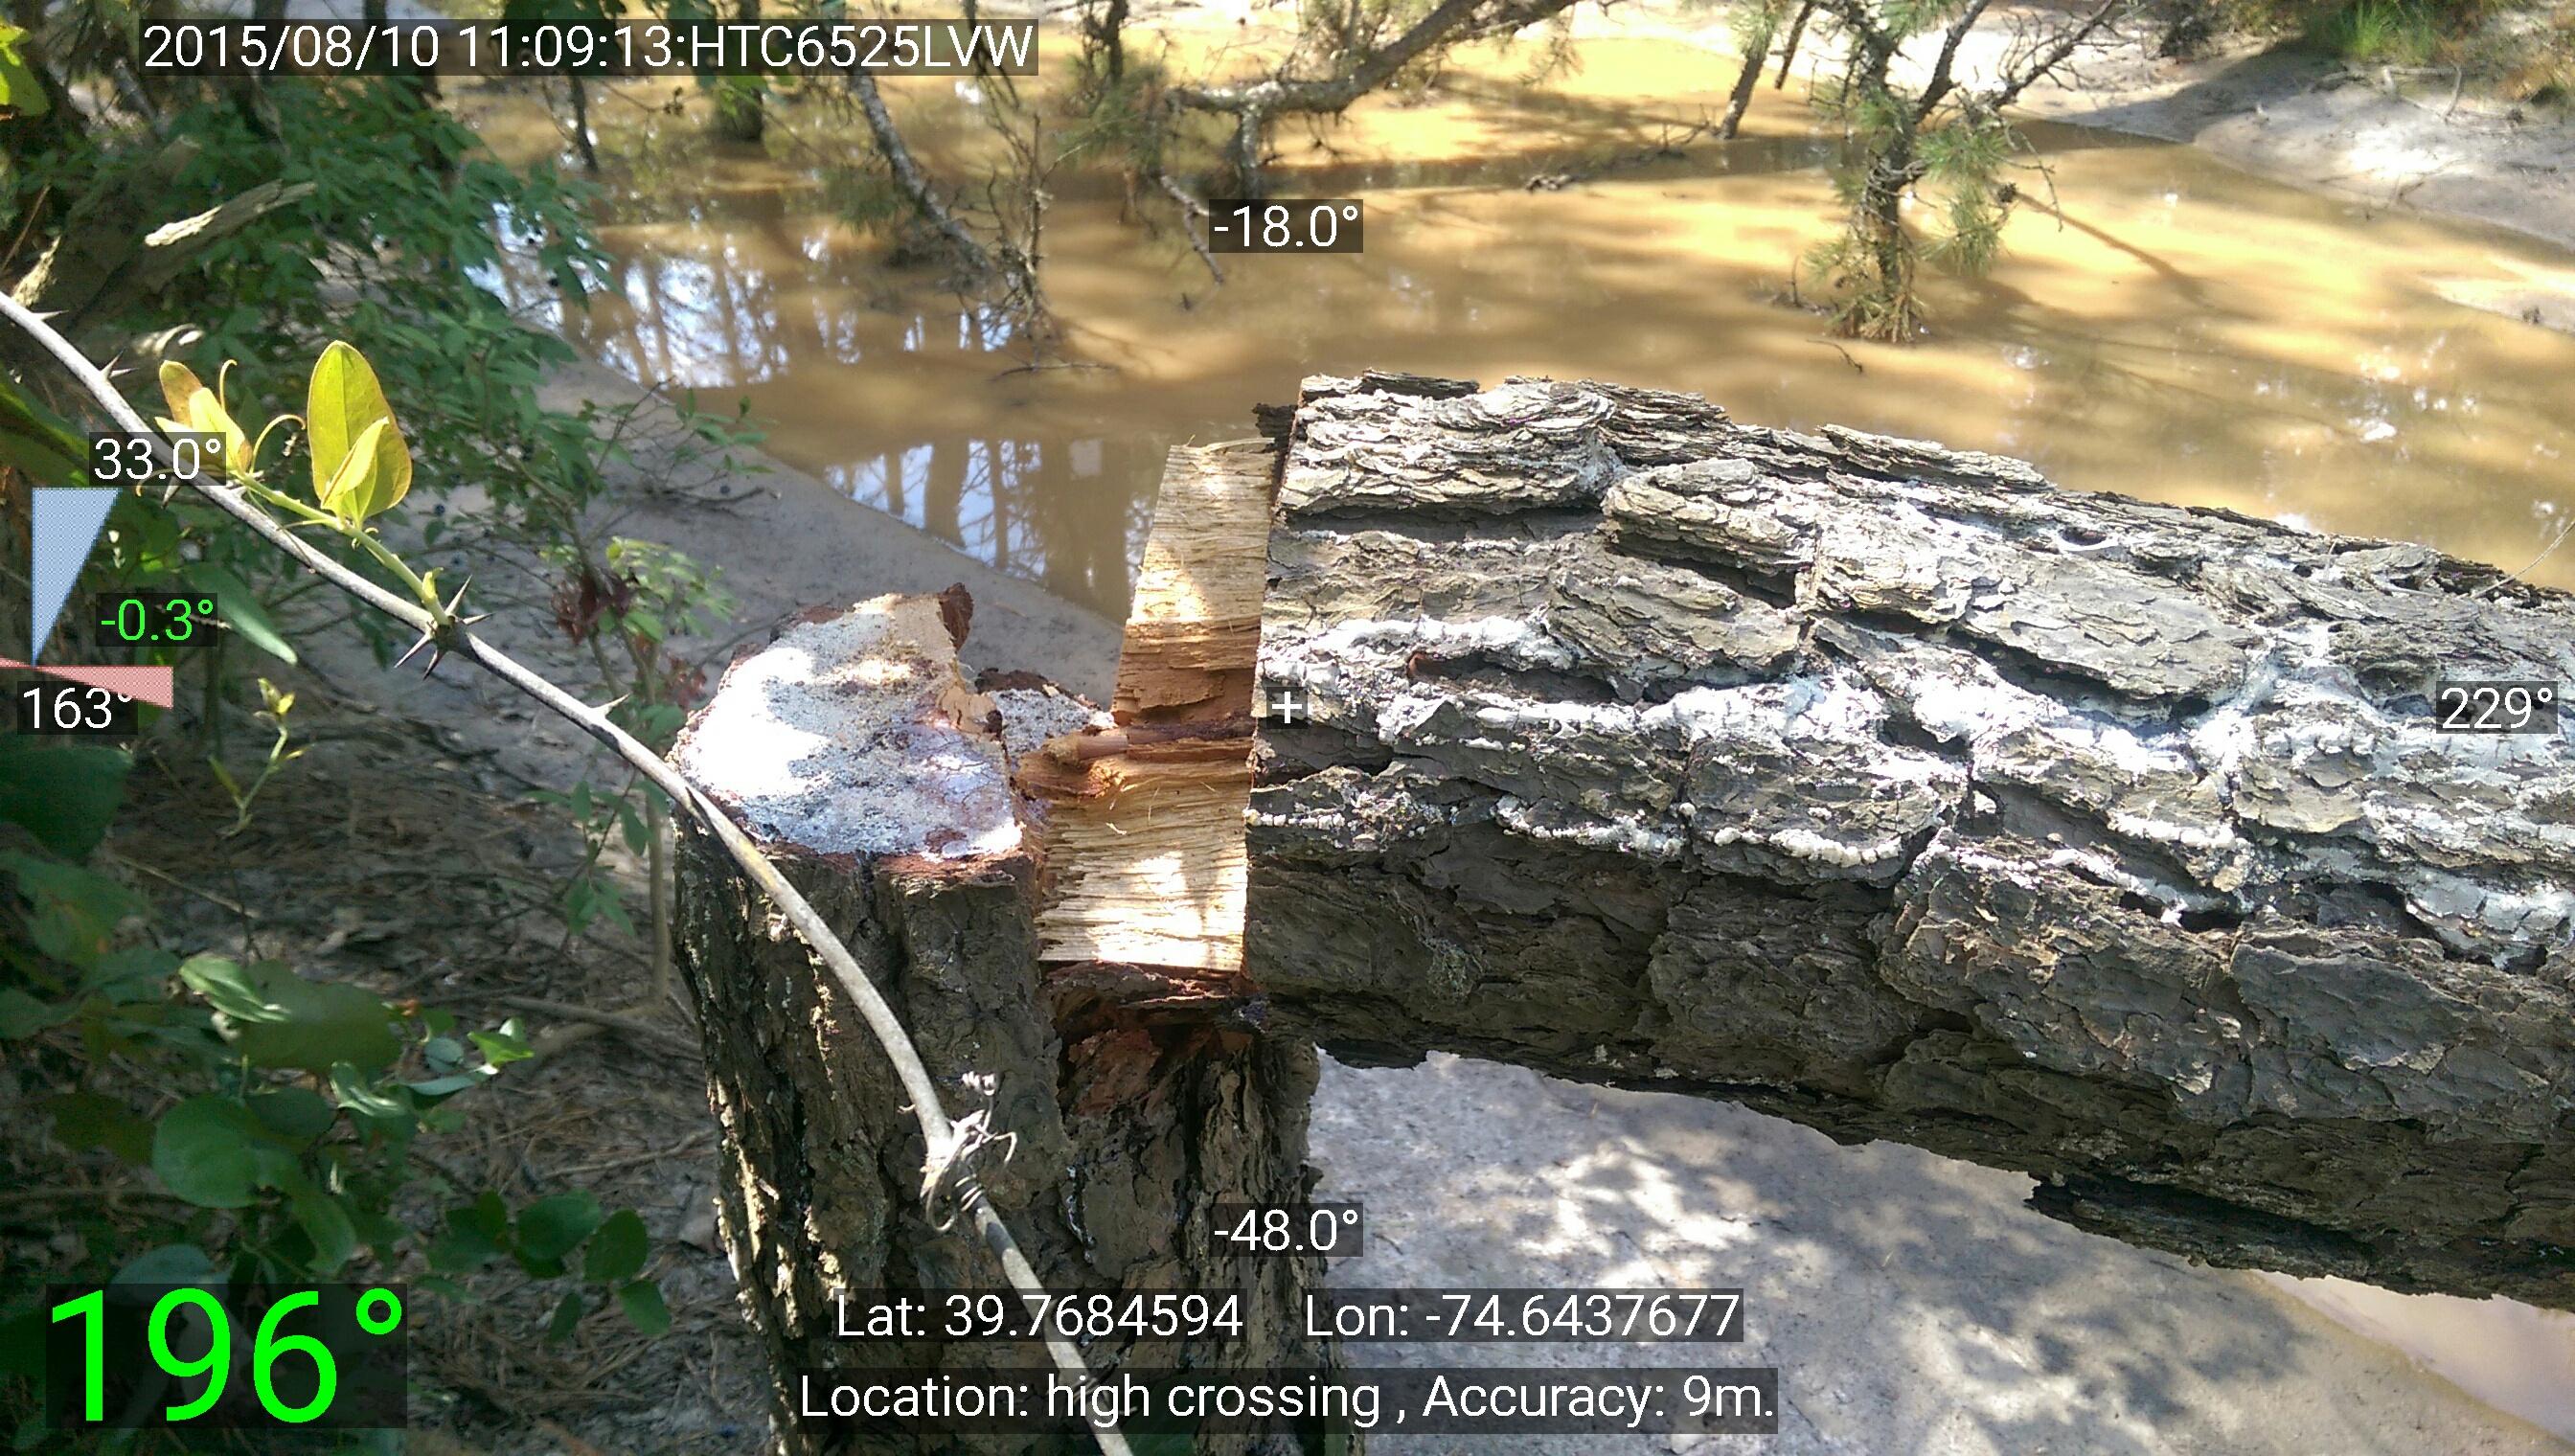 high crossing. L.39.7684594_-74.6437677 D.196 T.20150810_110912-1